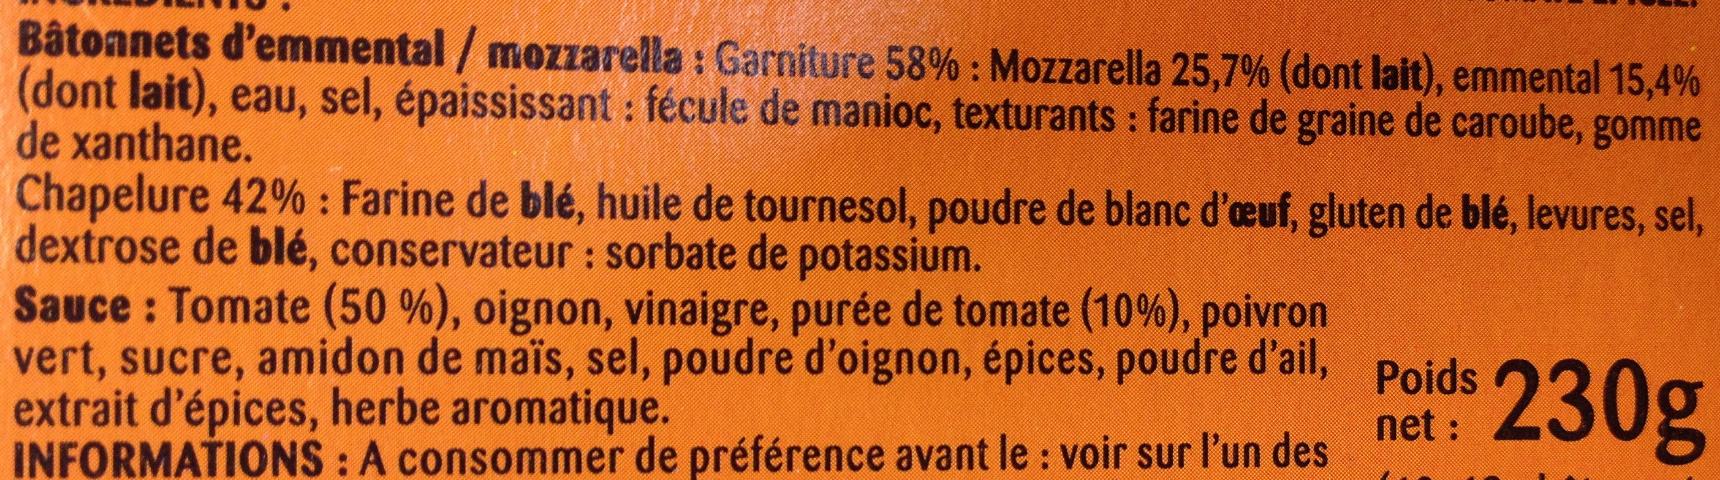 Salade & Apéro Cheese' Sticks - Ingredients - fr